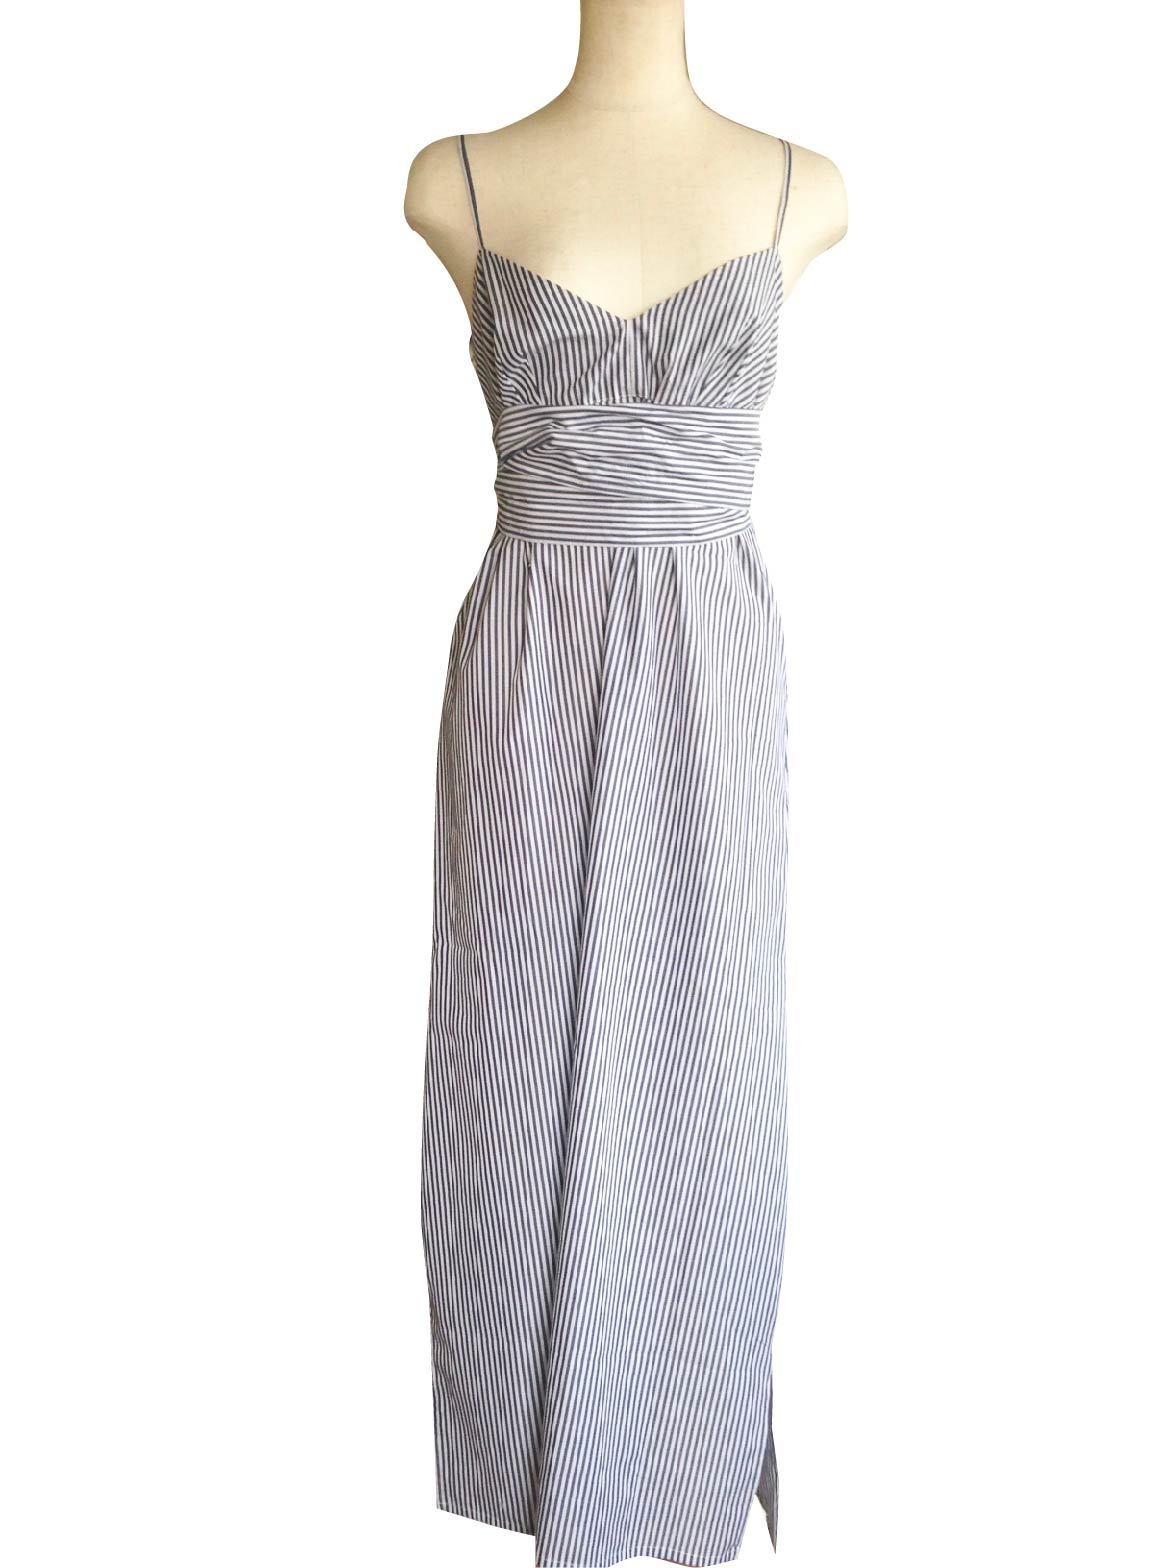 3Ways Maxi Dress Stripe Blue 3ウェイマキシドレスストライプブルー